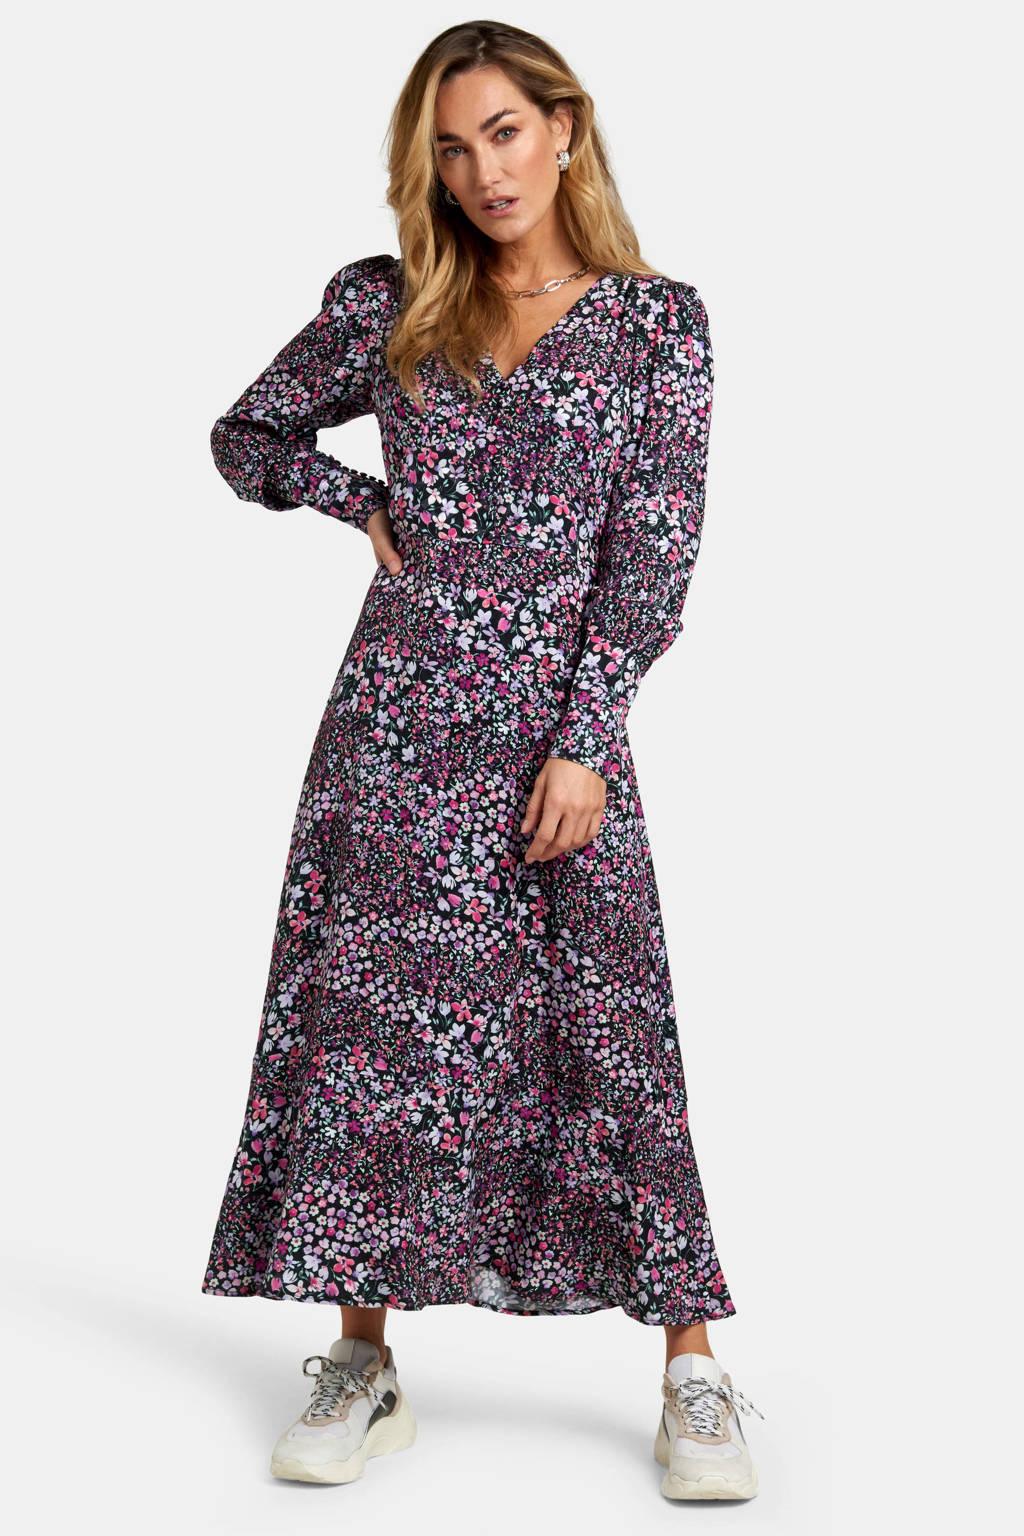 Eksept by Shoeby gebloemde maxi jurk paars/roze, Paars/roze